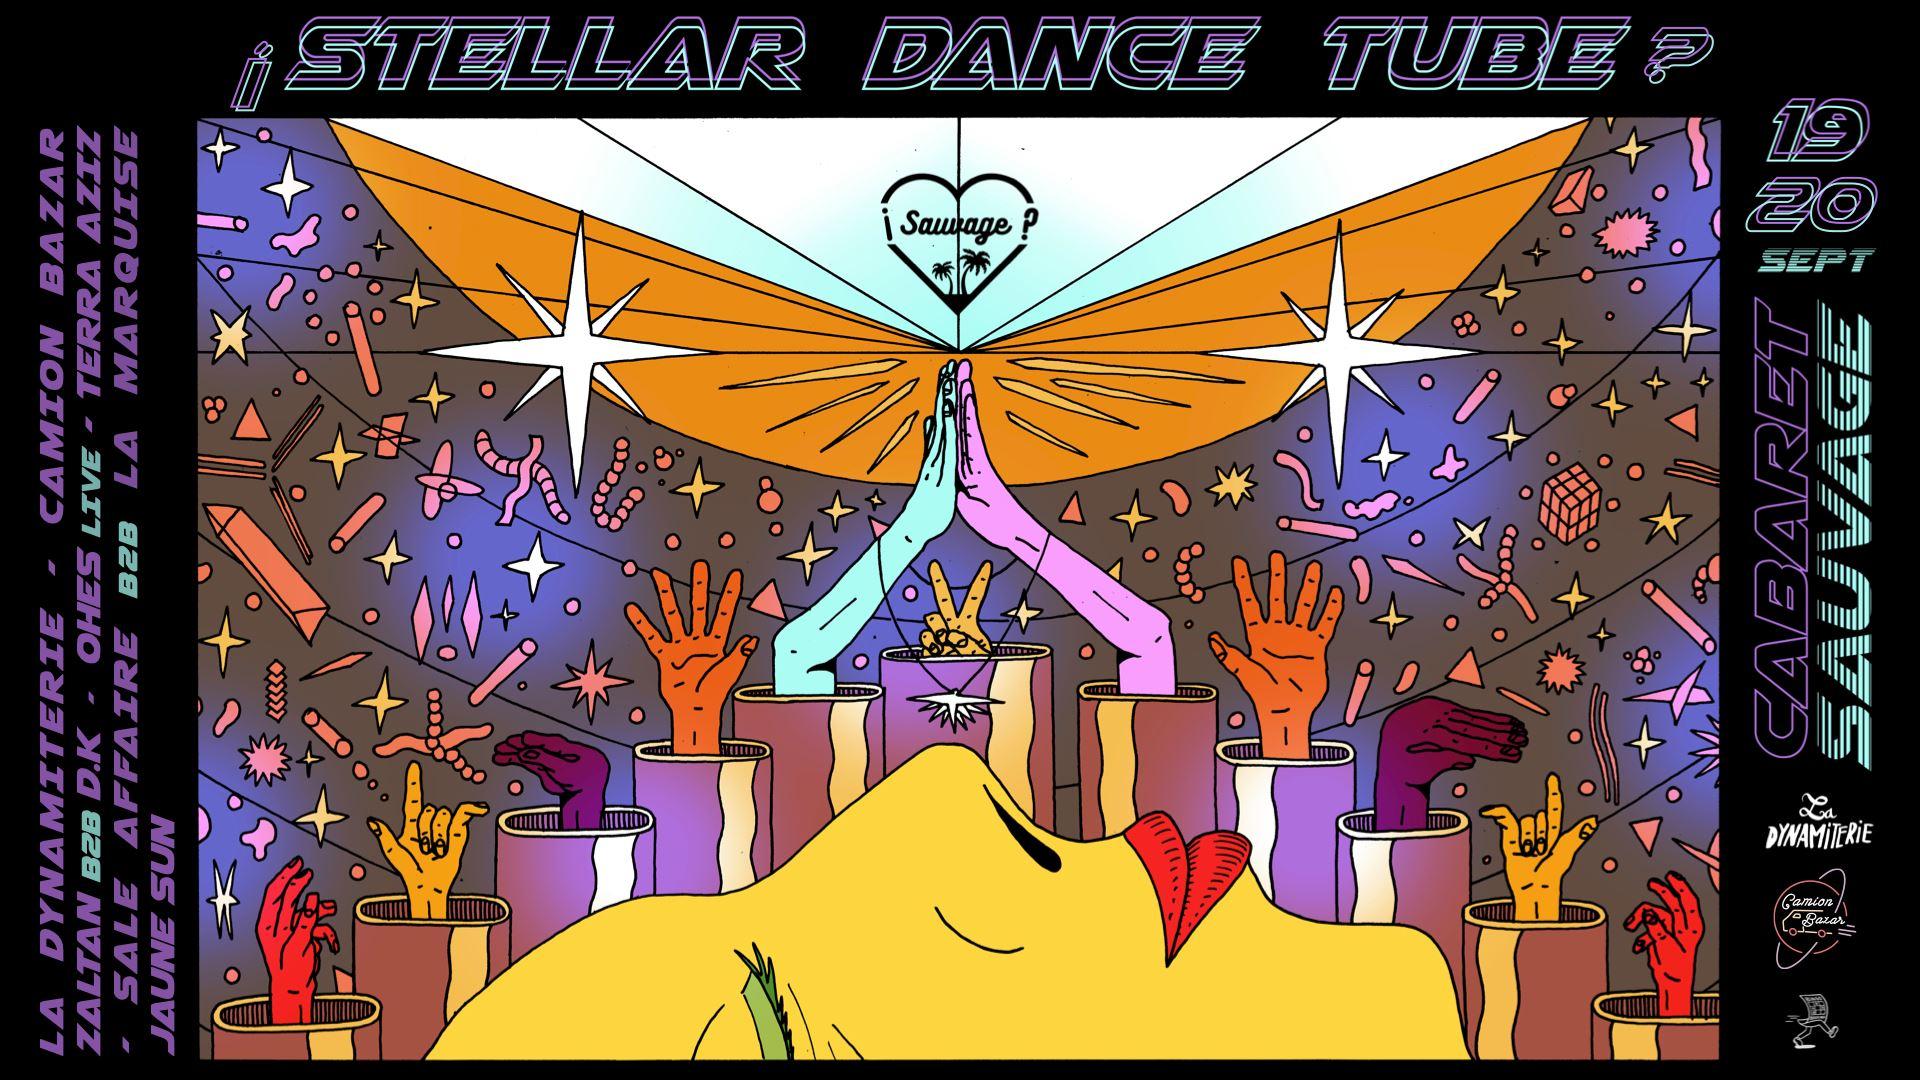 ¡Stellar Dance Tube?